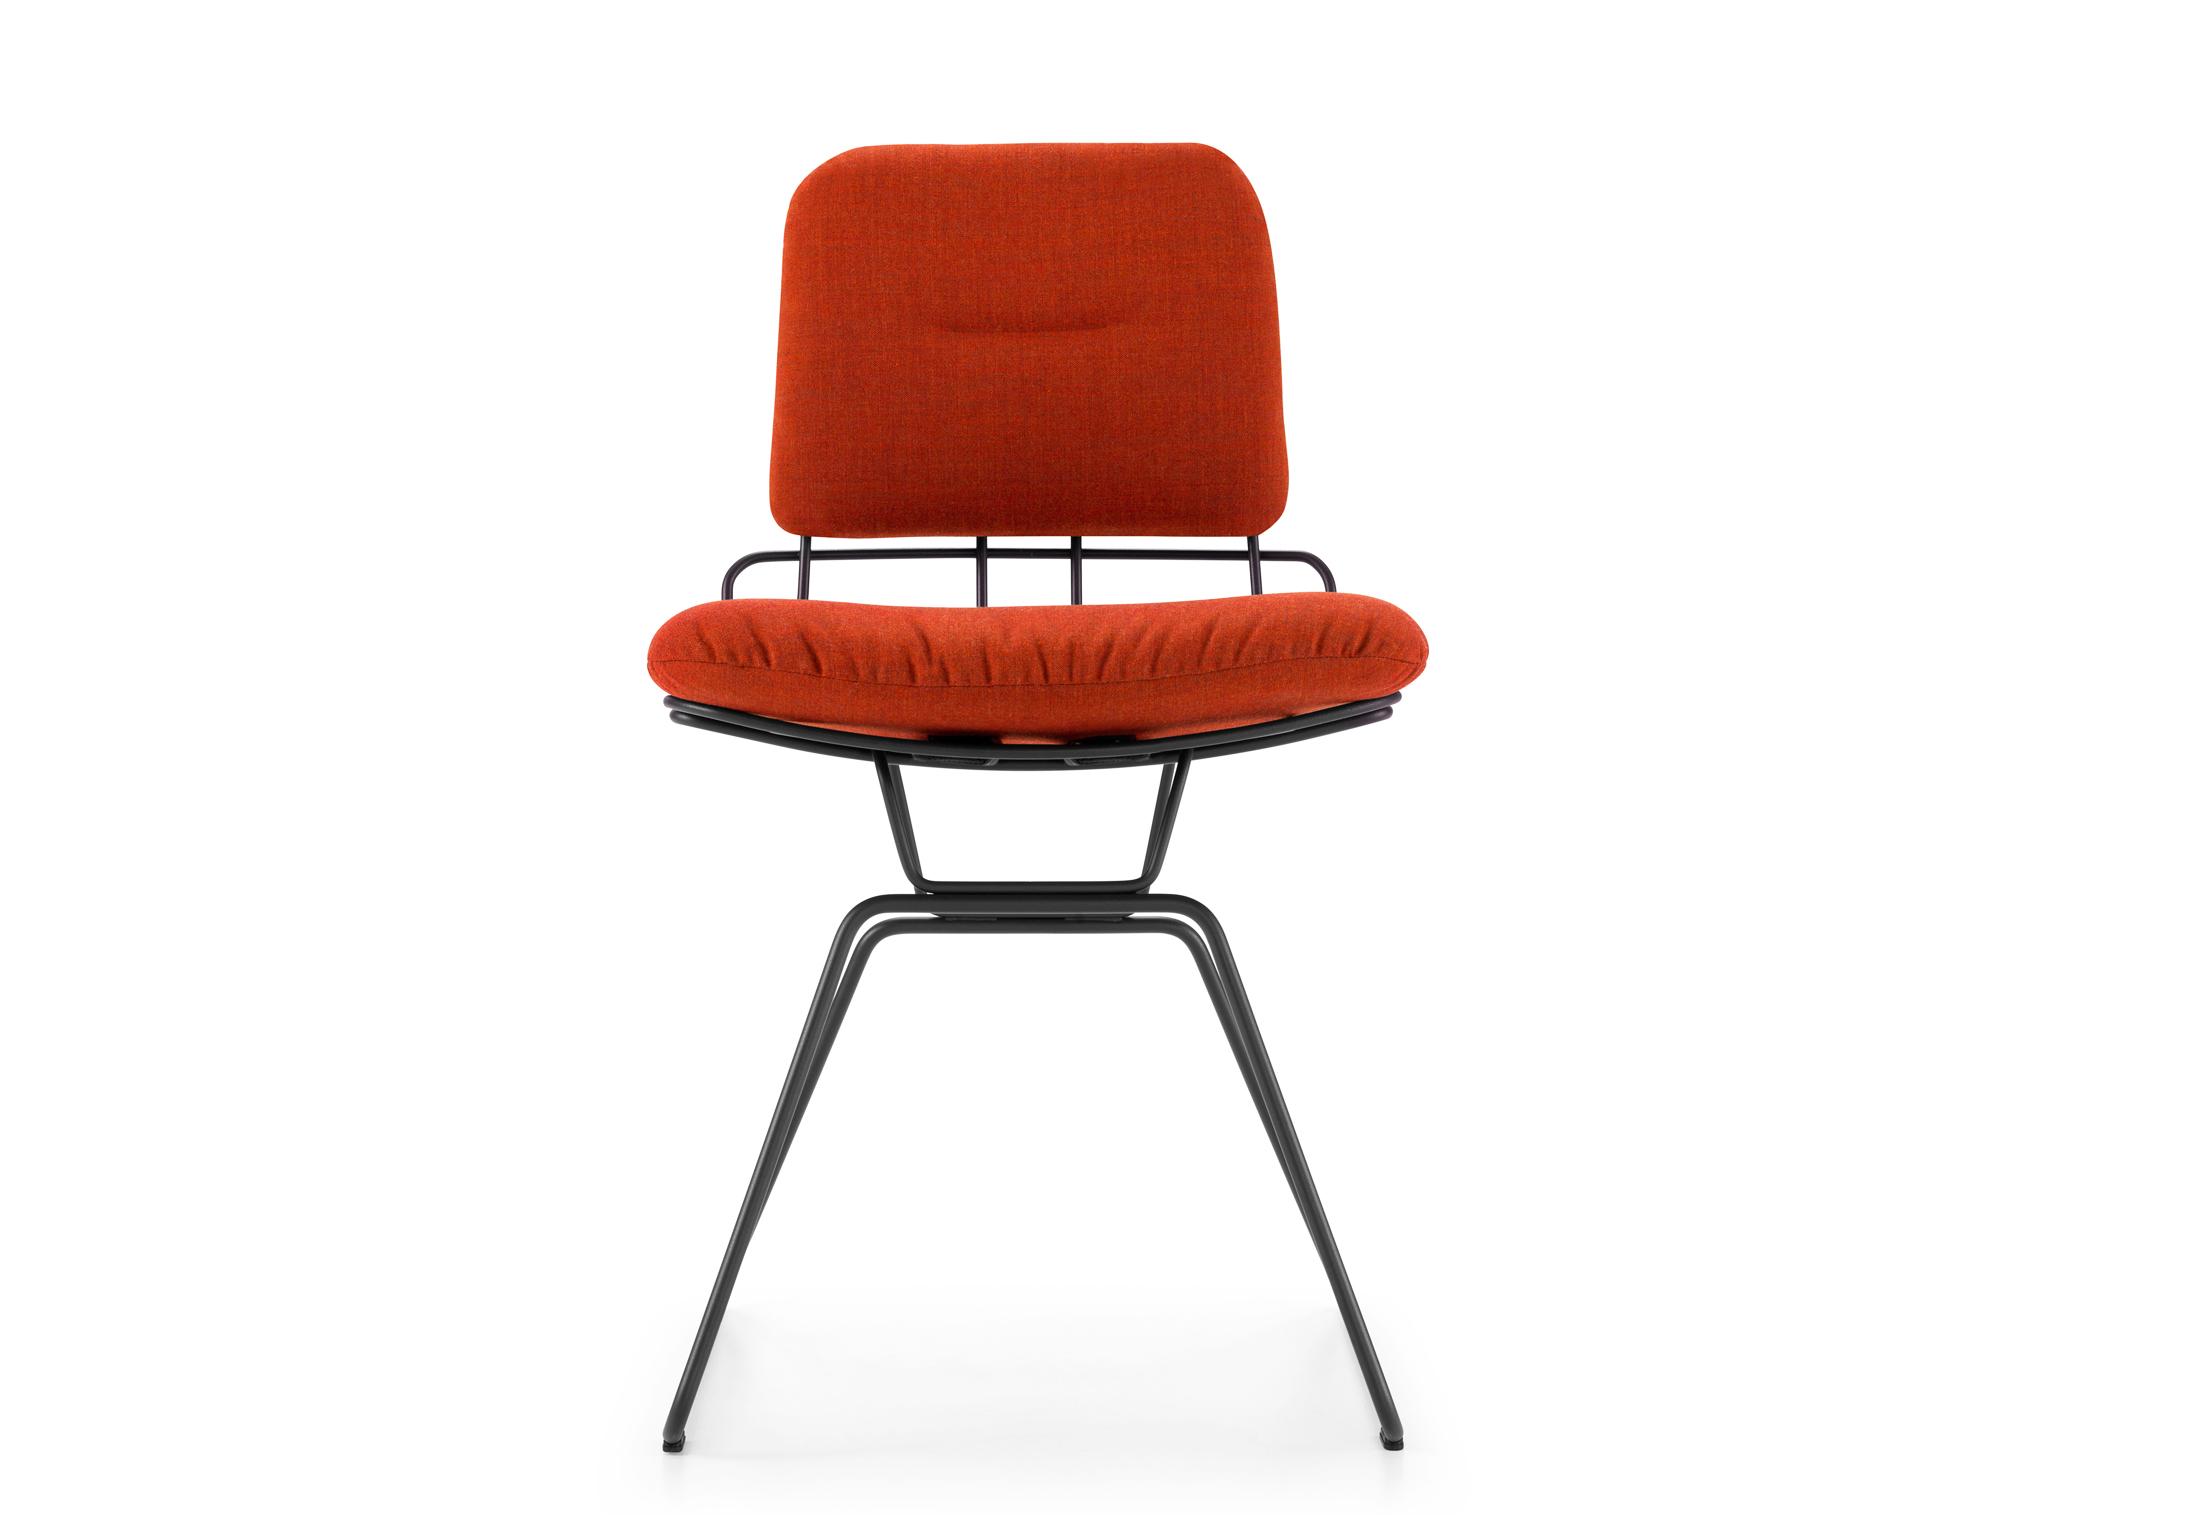 Alambre Chair by Alfredo Häberli for Girsberger